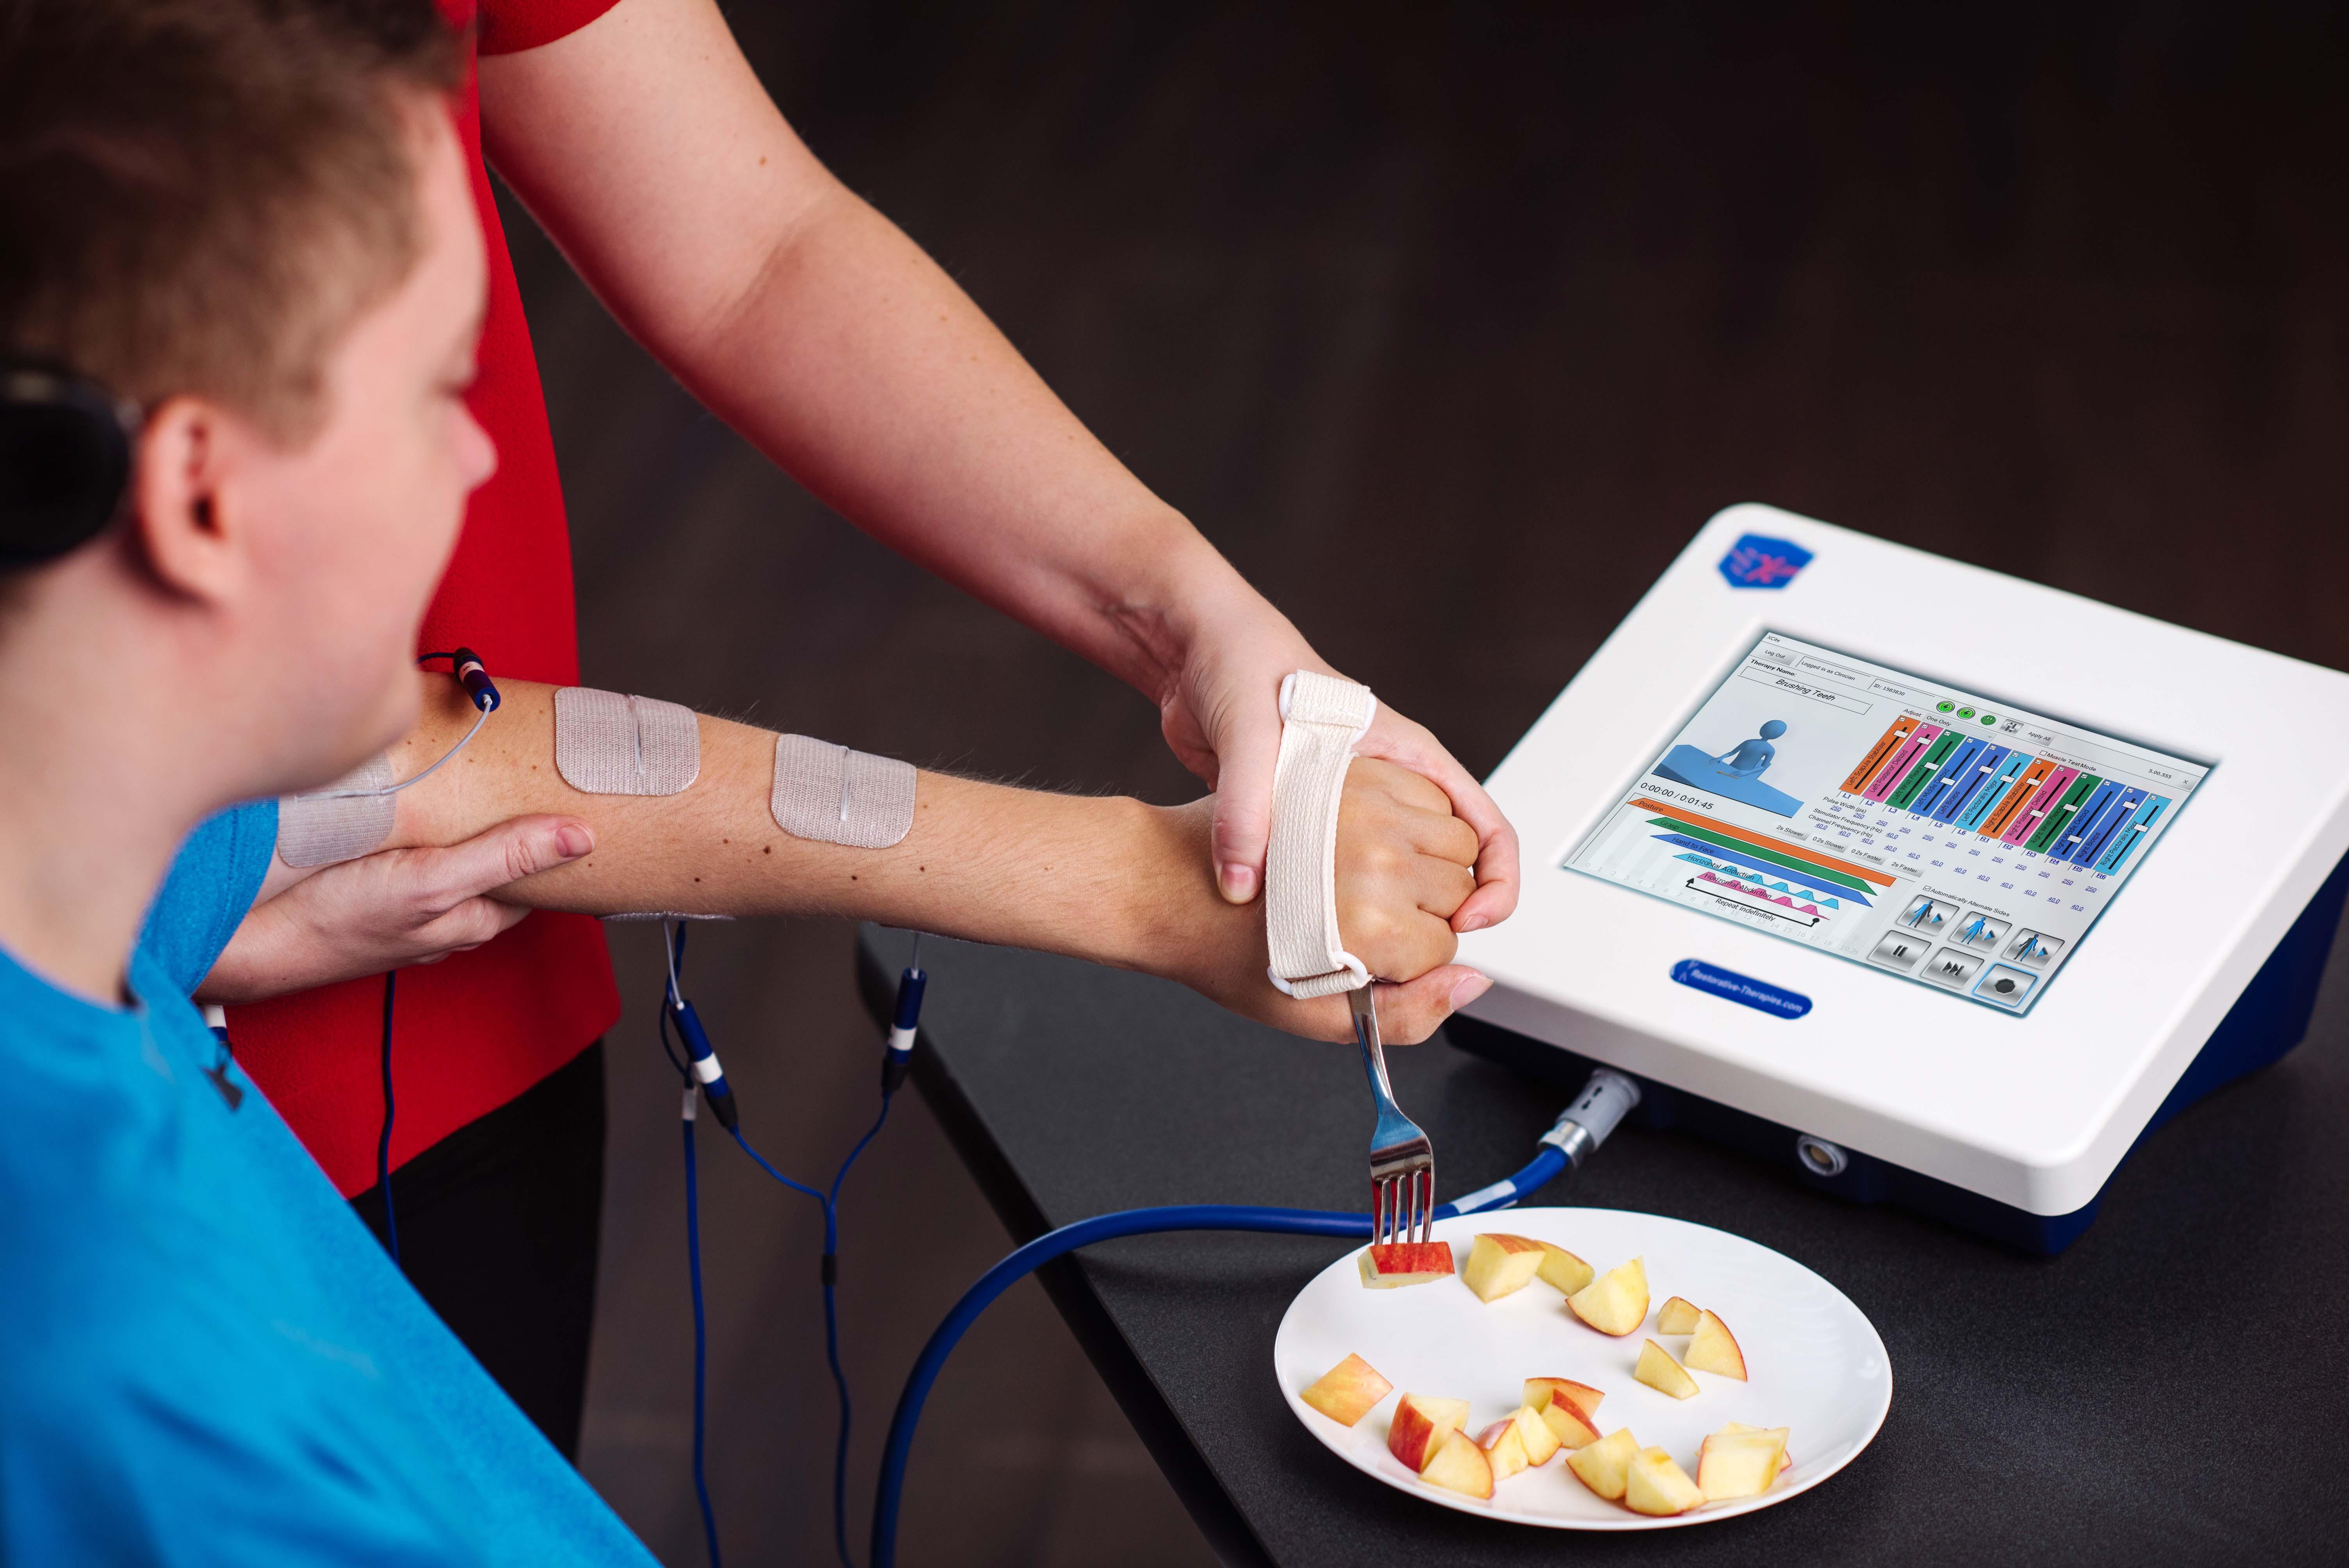 Restorative Therapies to Showcase Xcite FES System at APTA ...